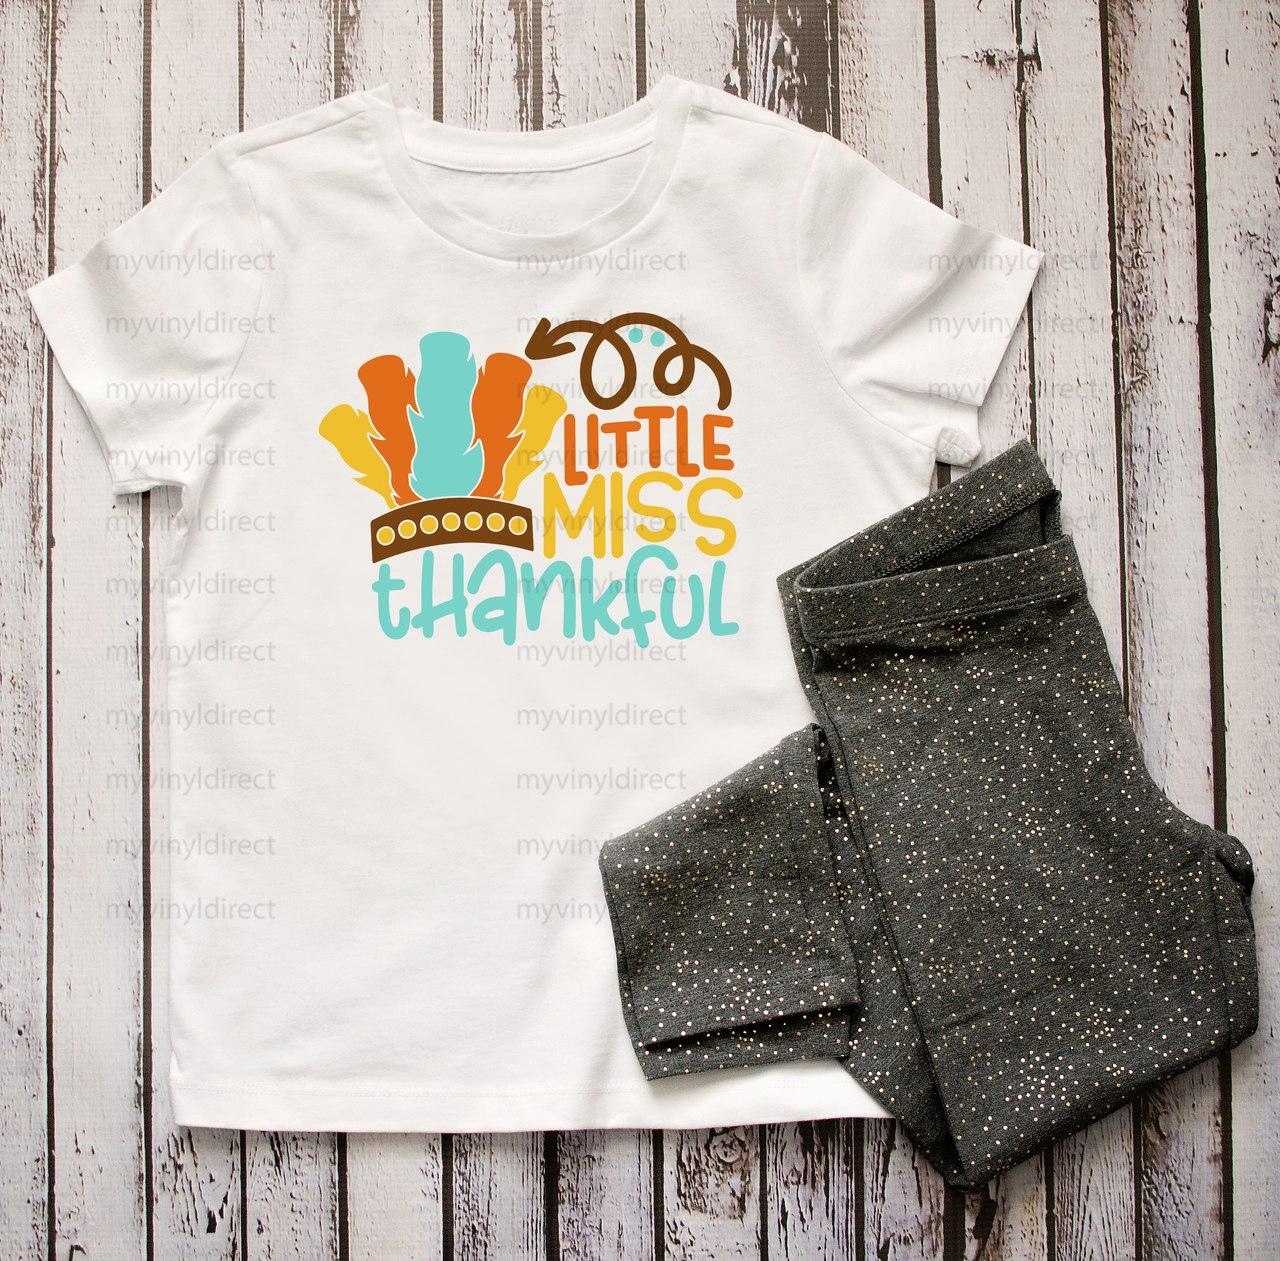 Little Miss Thankful | Cotton Transfer